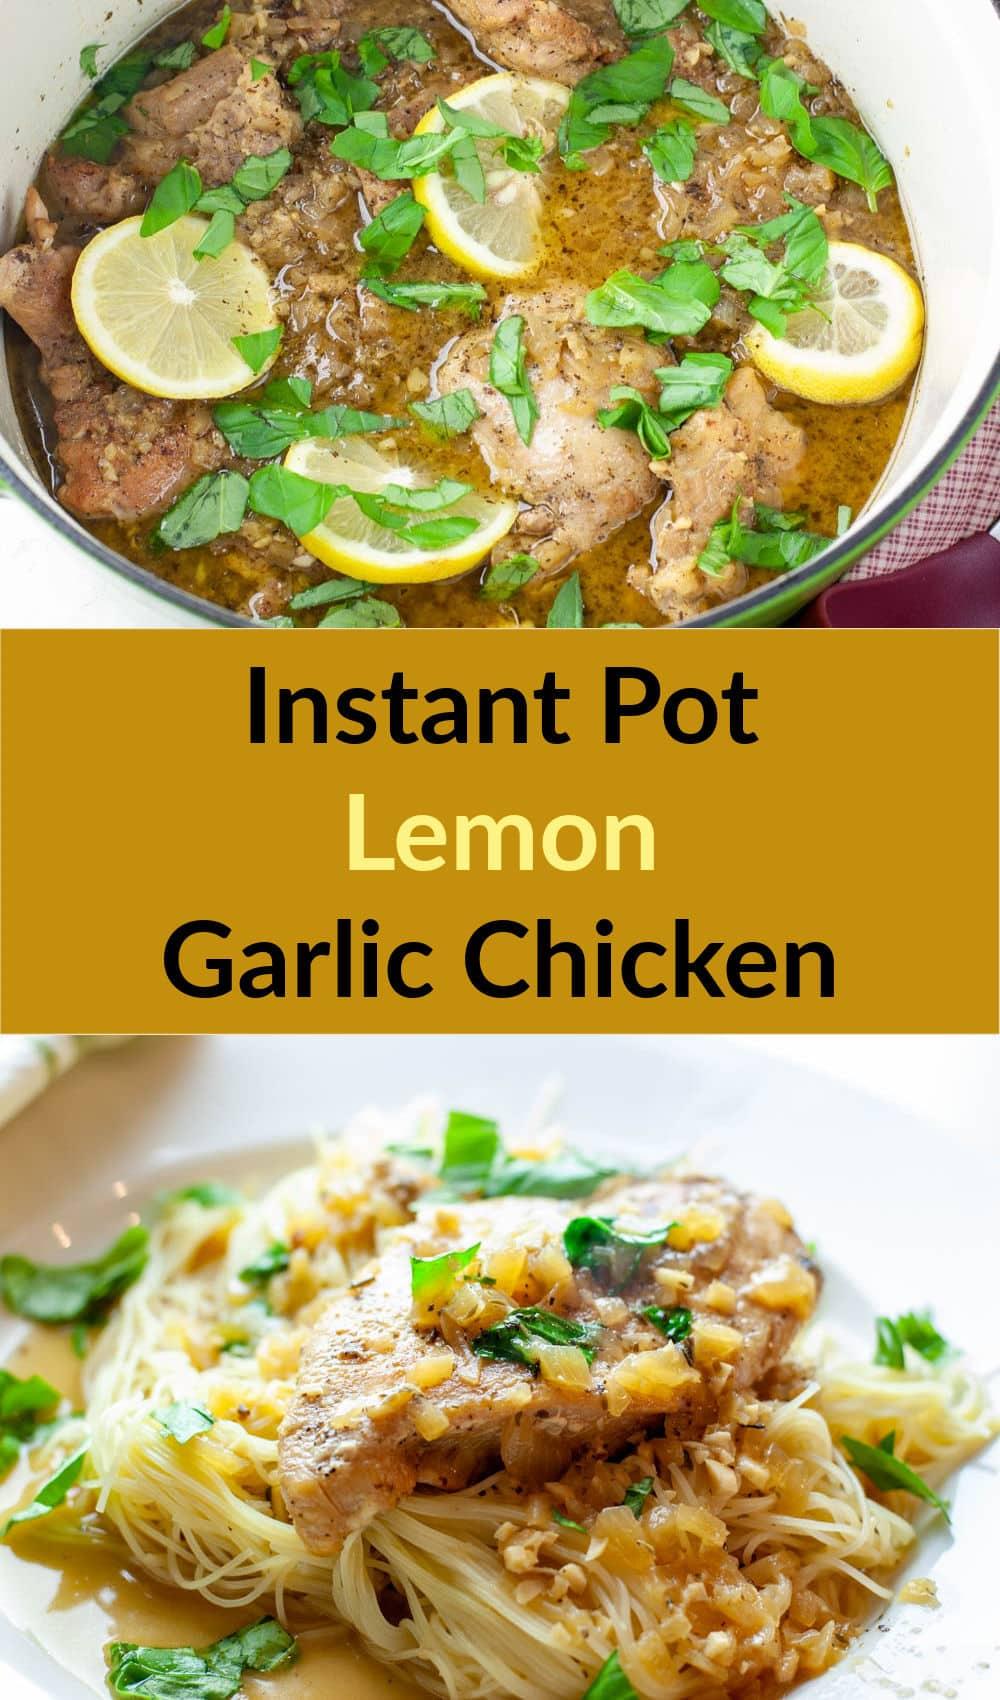 Instant Pot Lemon Garlic Chicken   Recipe in 2020   Lemon ...